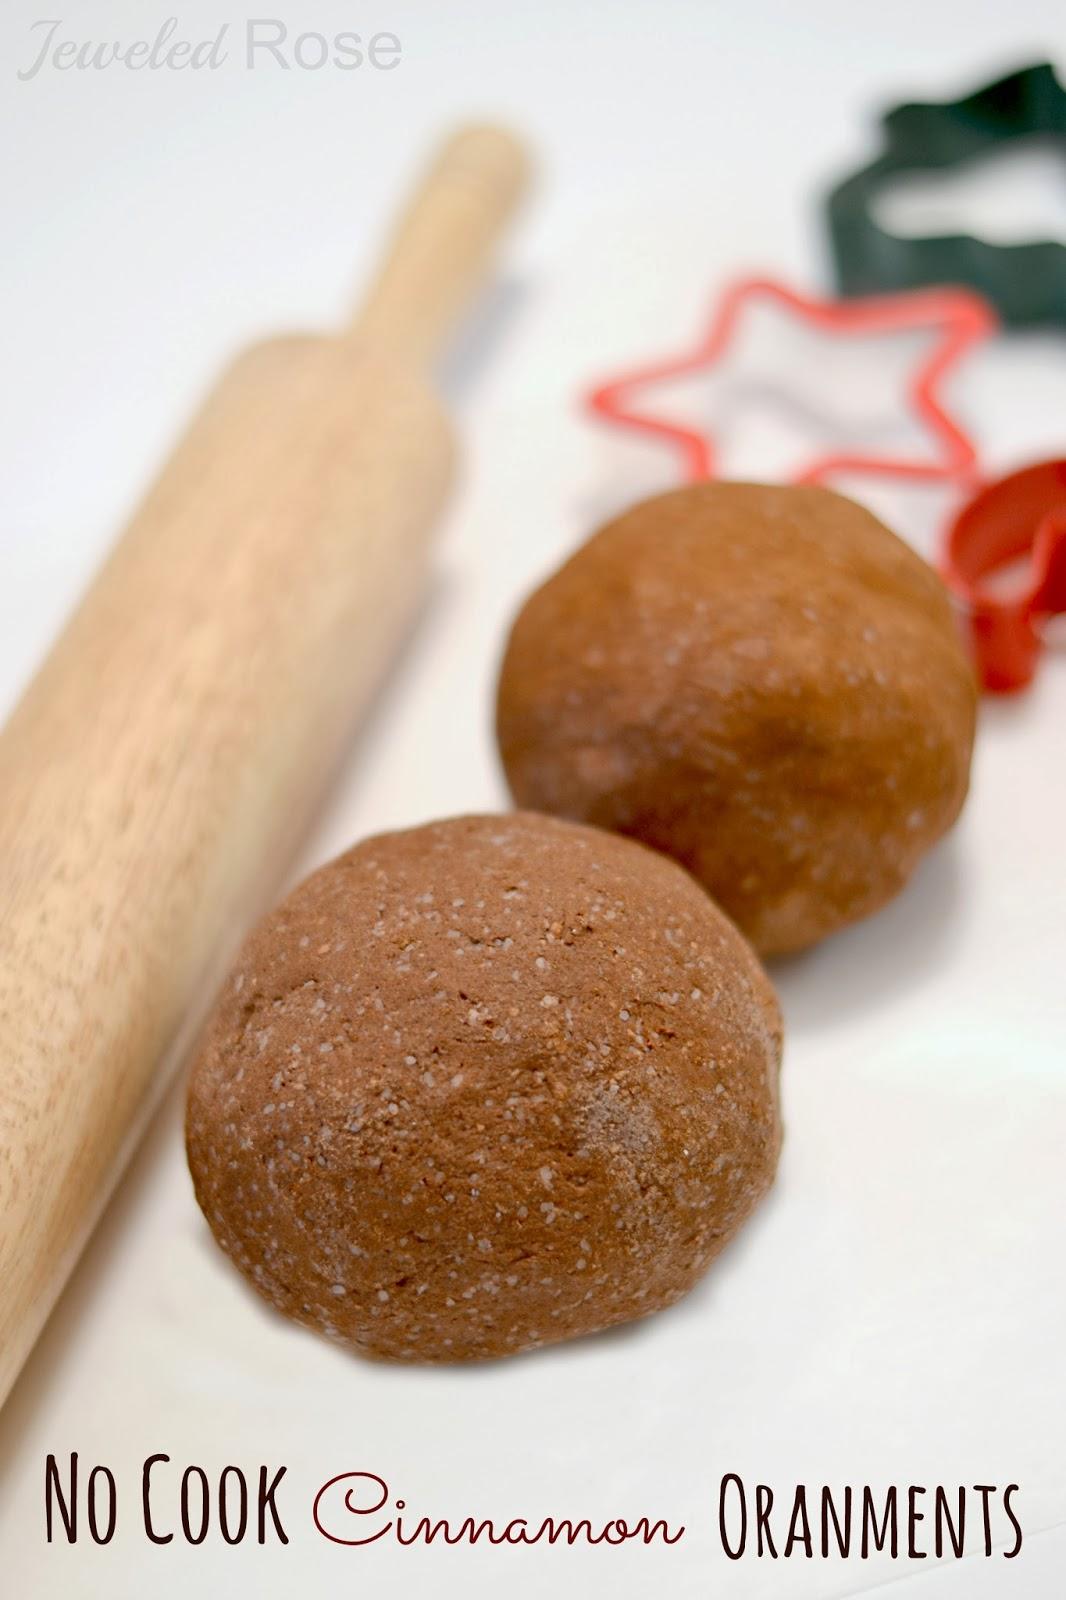 Homemade Christmas Ornaments Dough Cinnamon : No cook cinnamon ornaments growing a jeweled rose